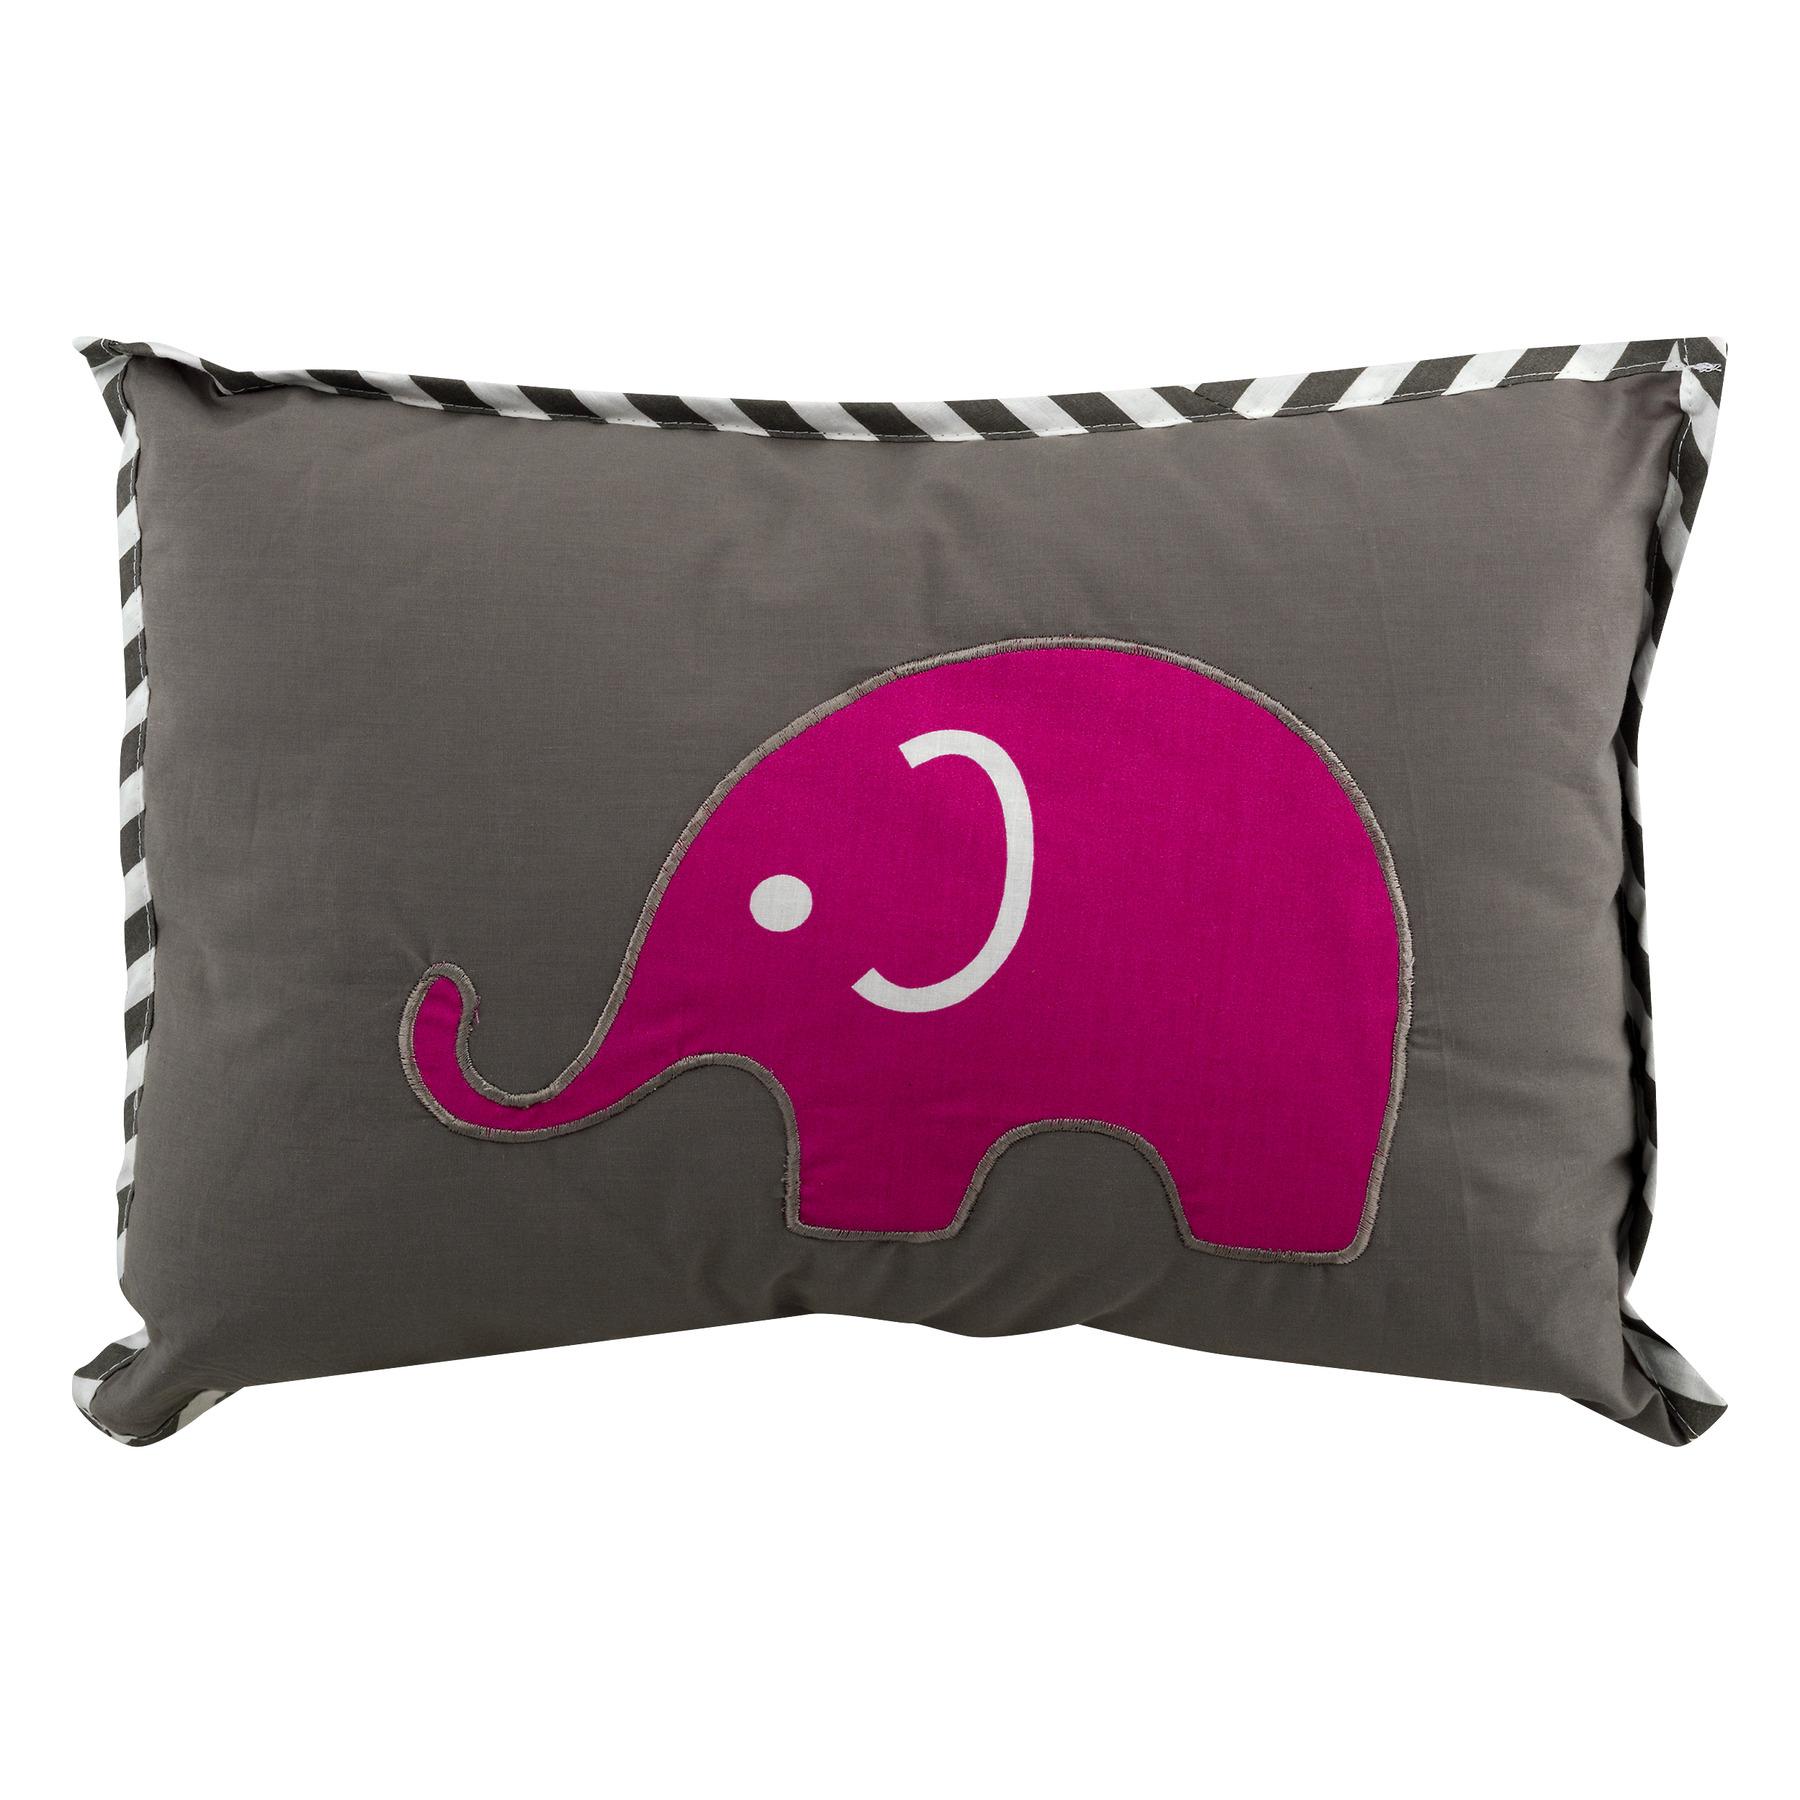 Bacati Decorative Pillow Pink/Grey Elephants, 1.0 CT